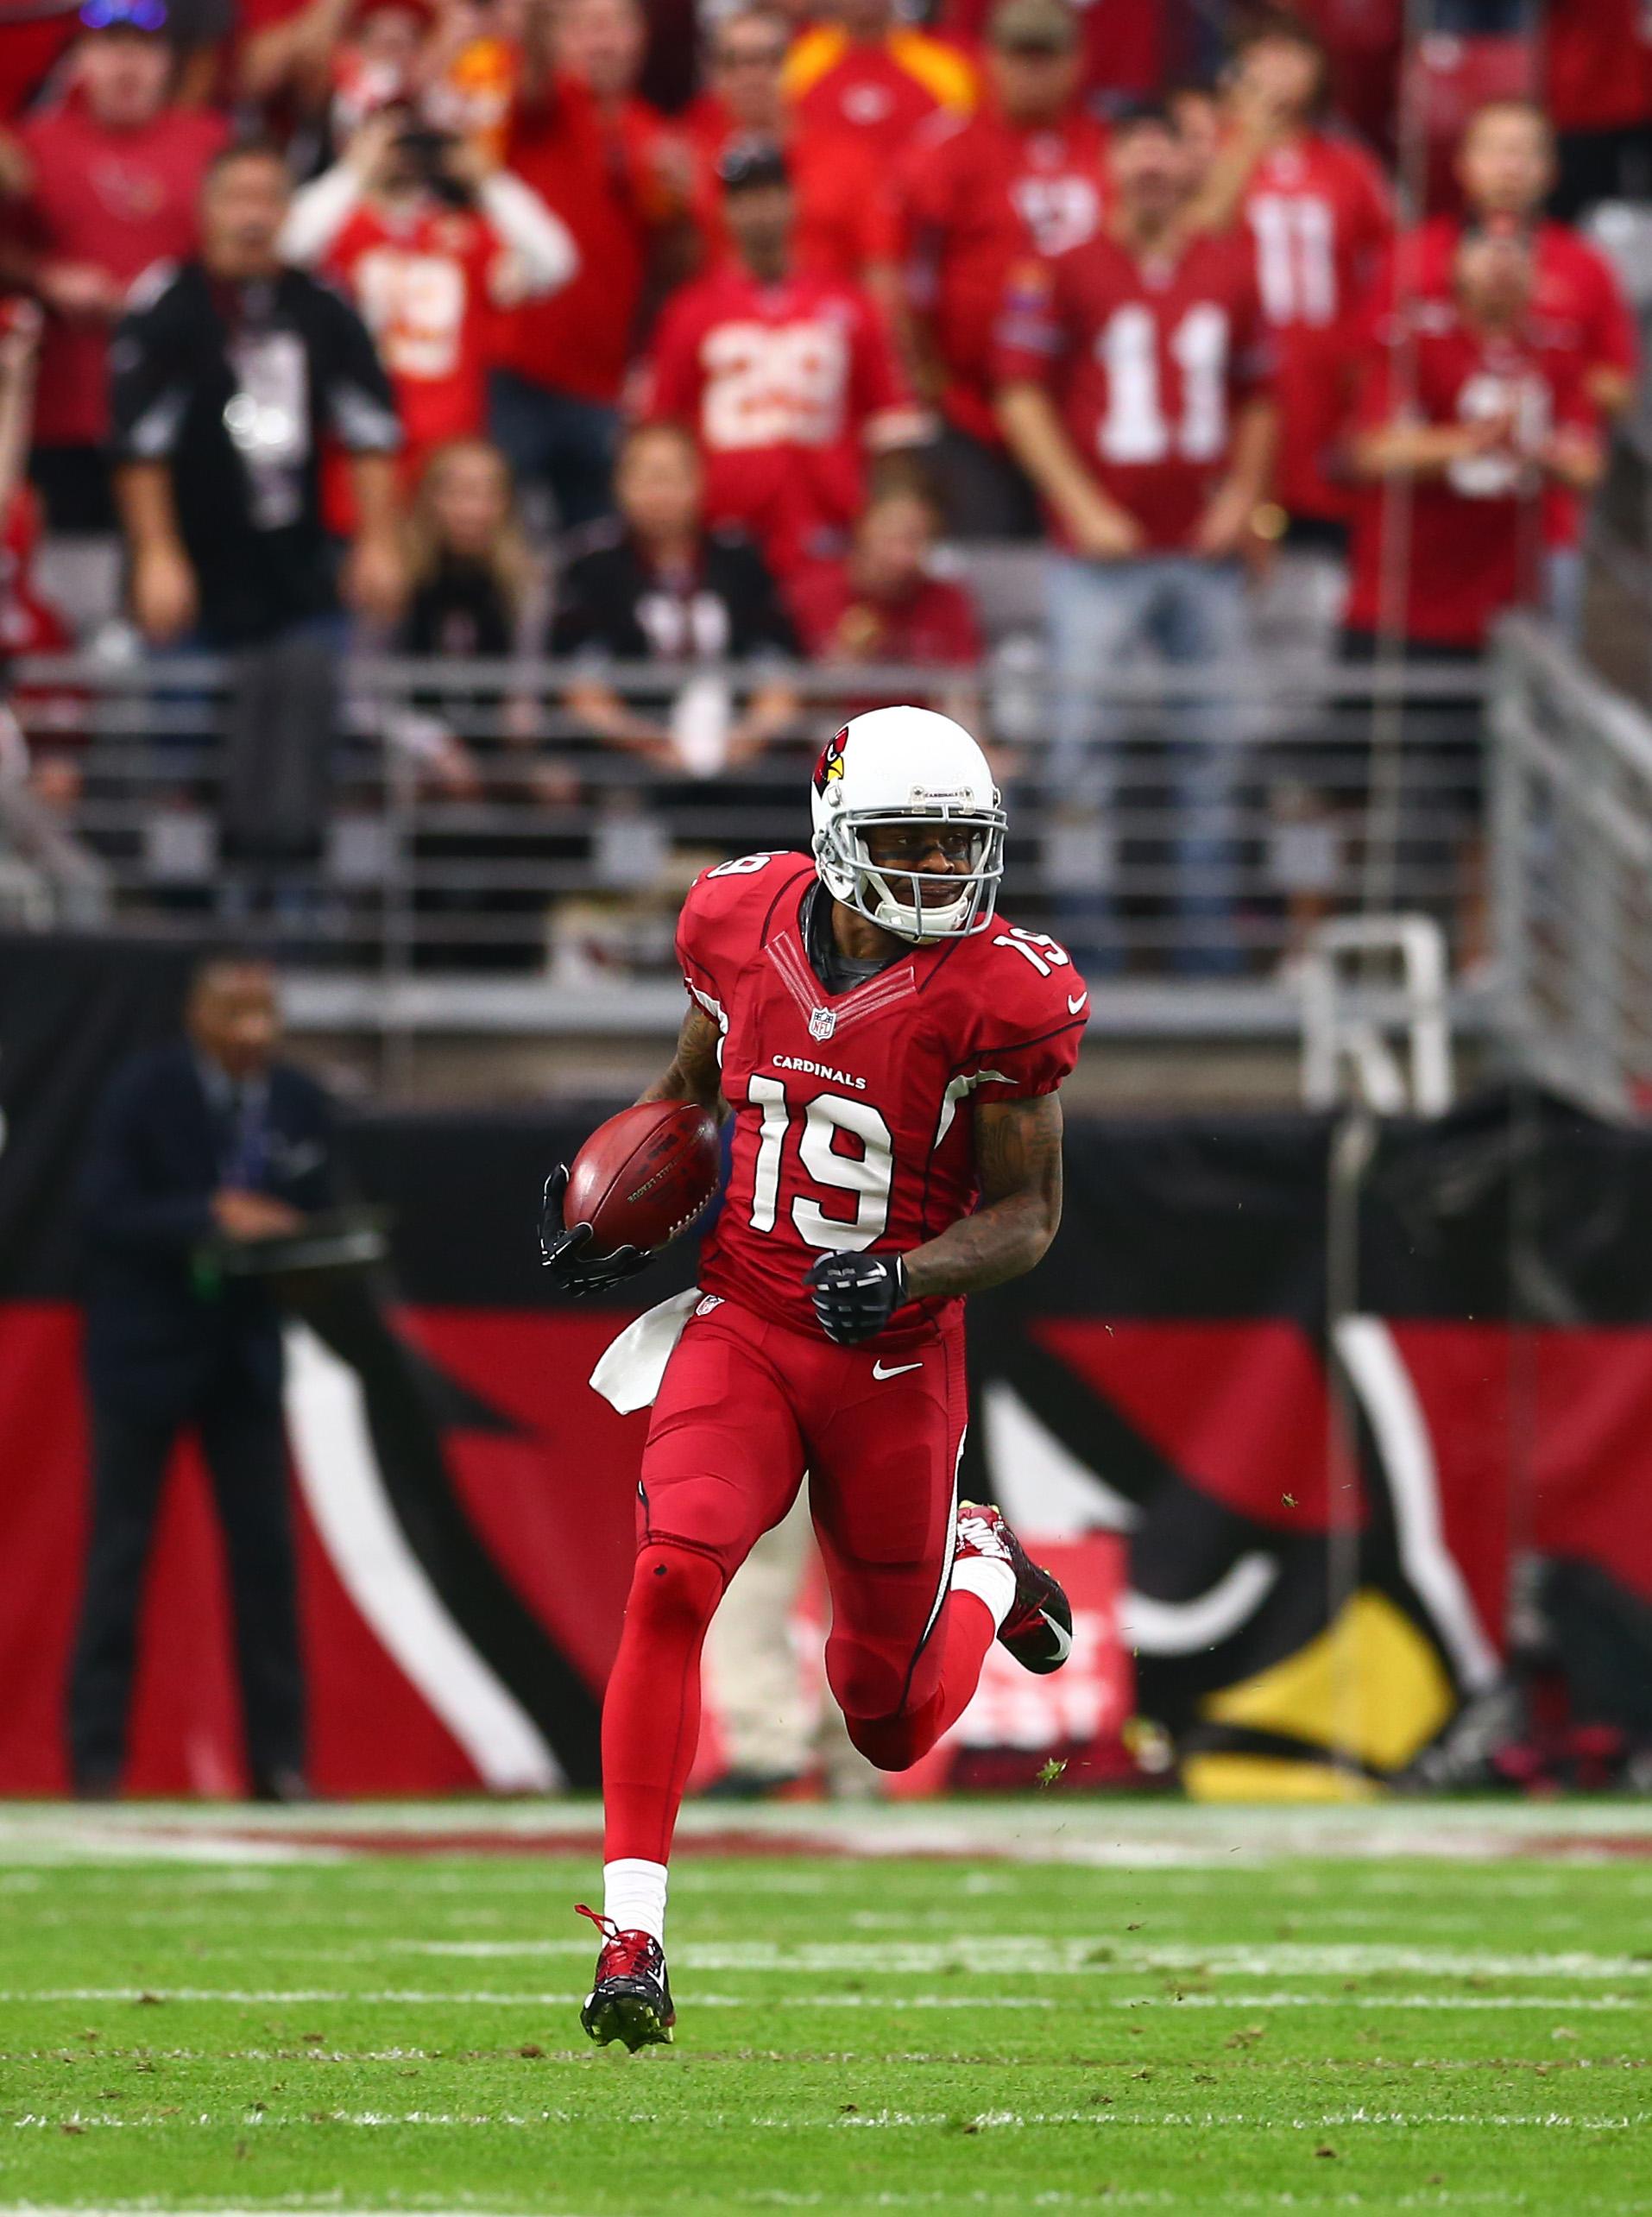 Cardinals release wide receiver Ted Ginn Jr.